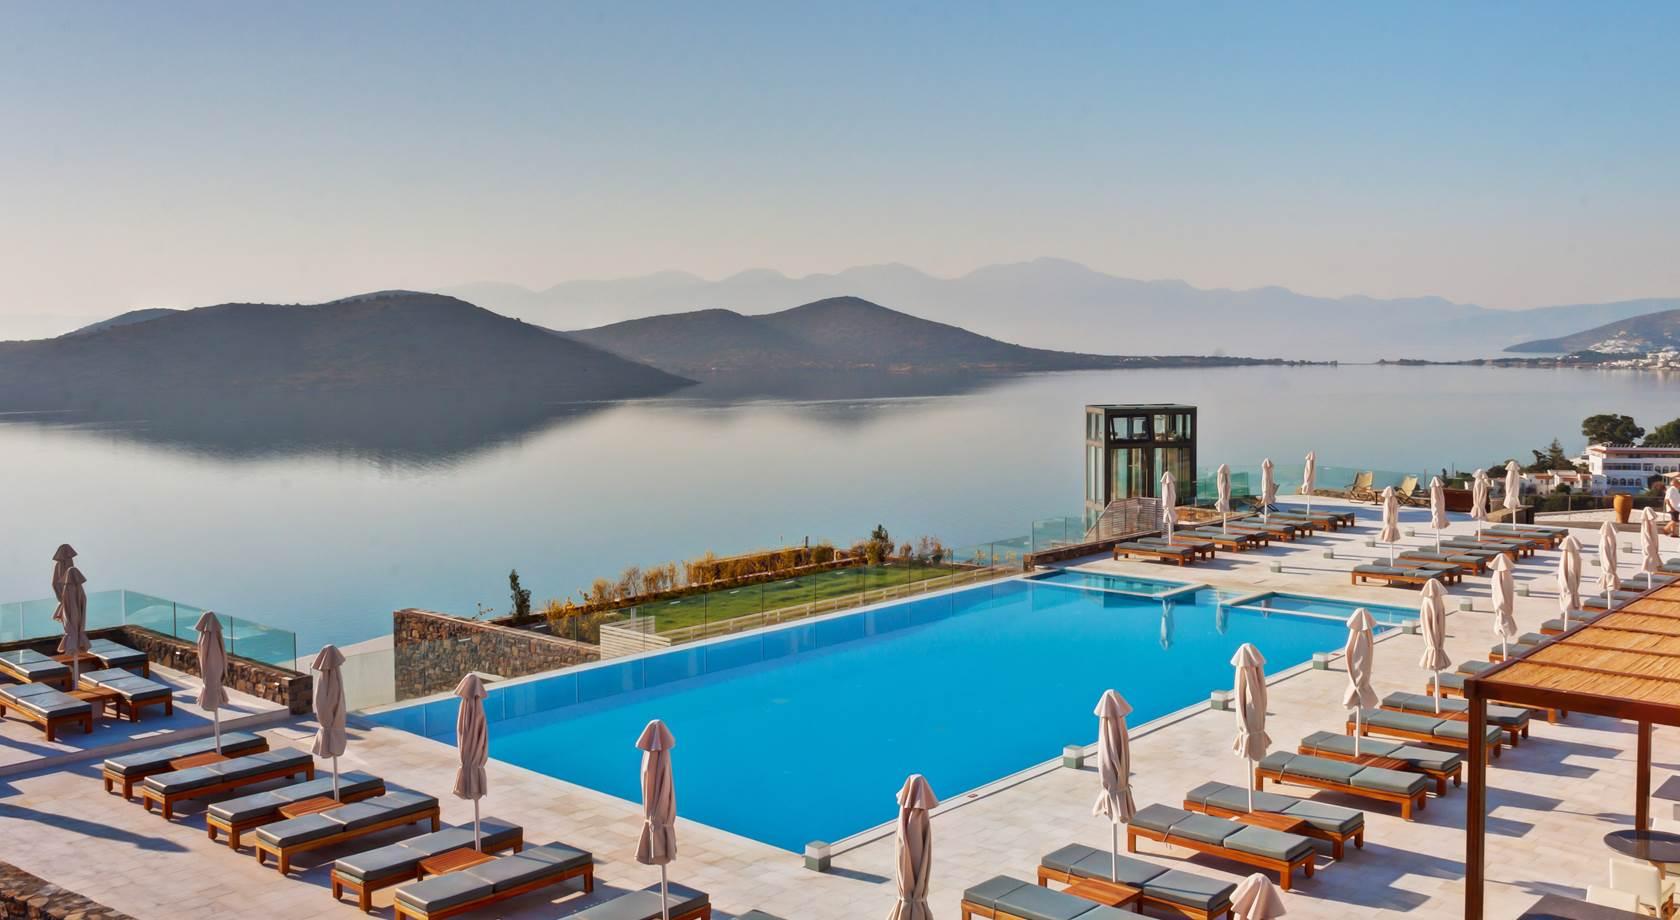 Royal Marmin Bay Elounda Crete Luxury Boutique Style Hotel